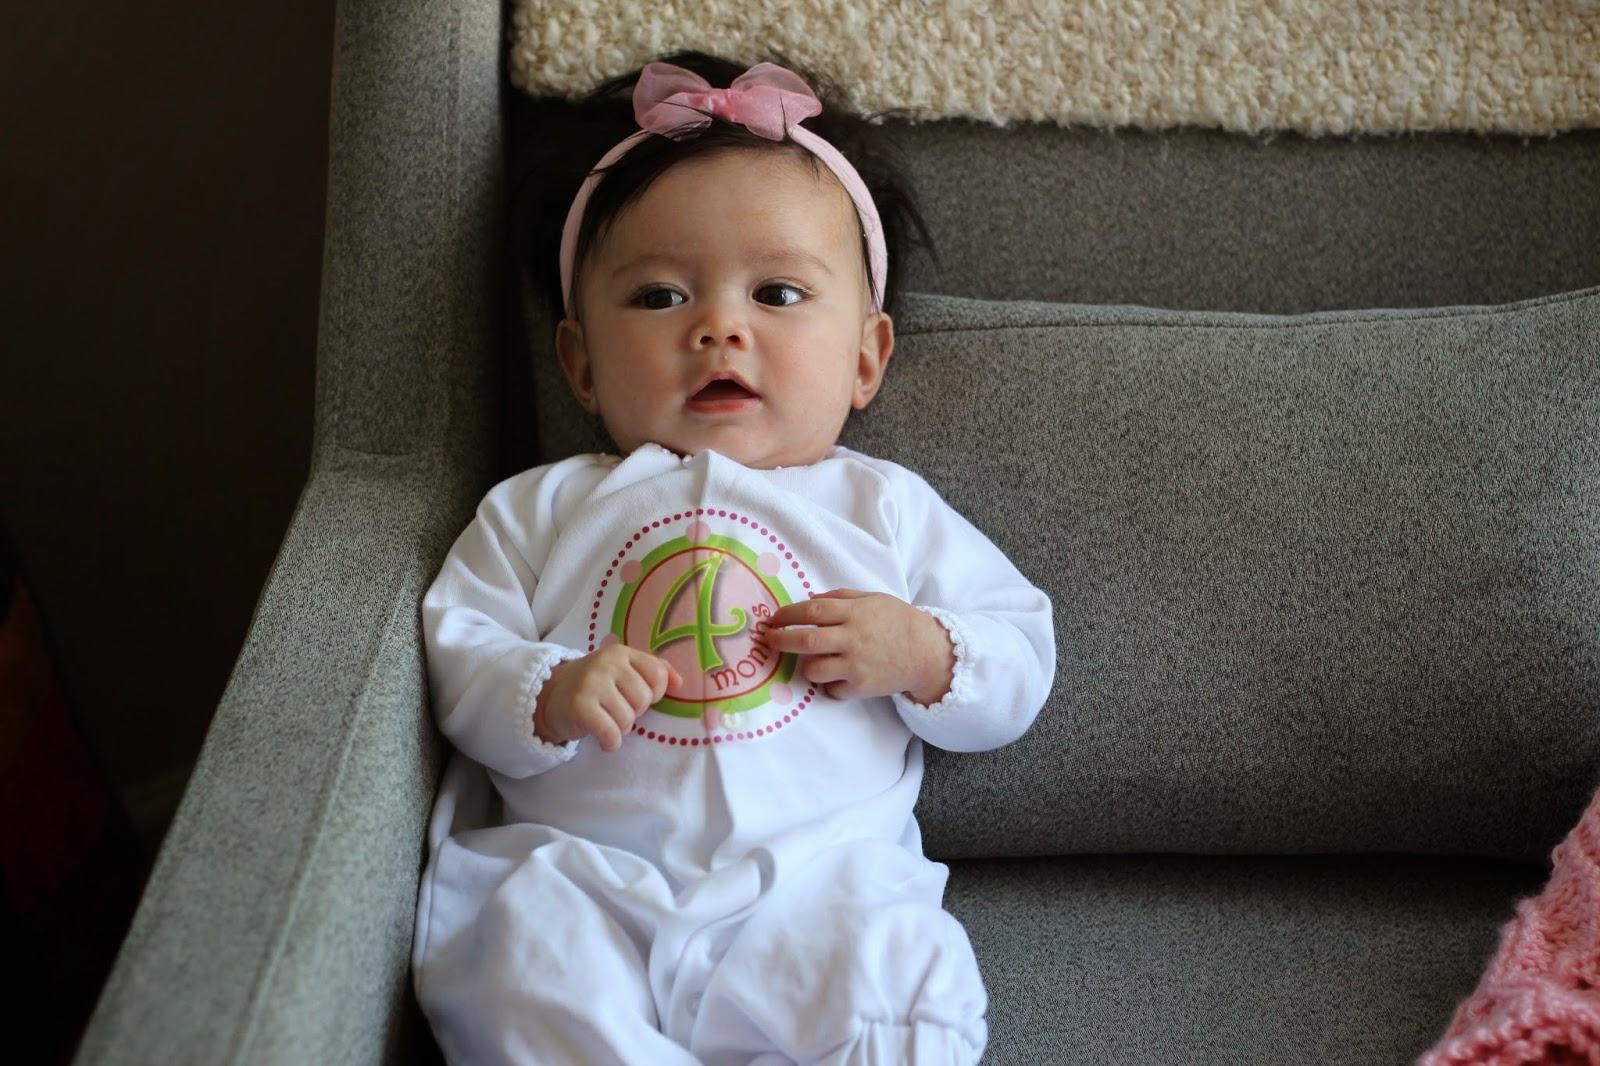 Galeri gambar bayi cantik dari korea lucu